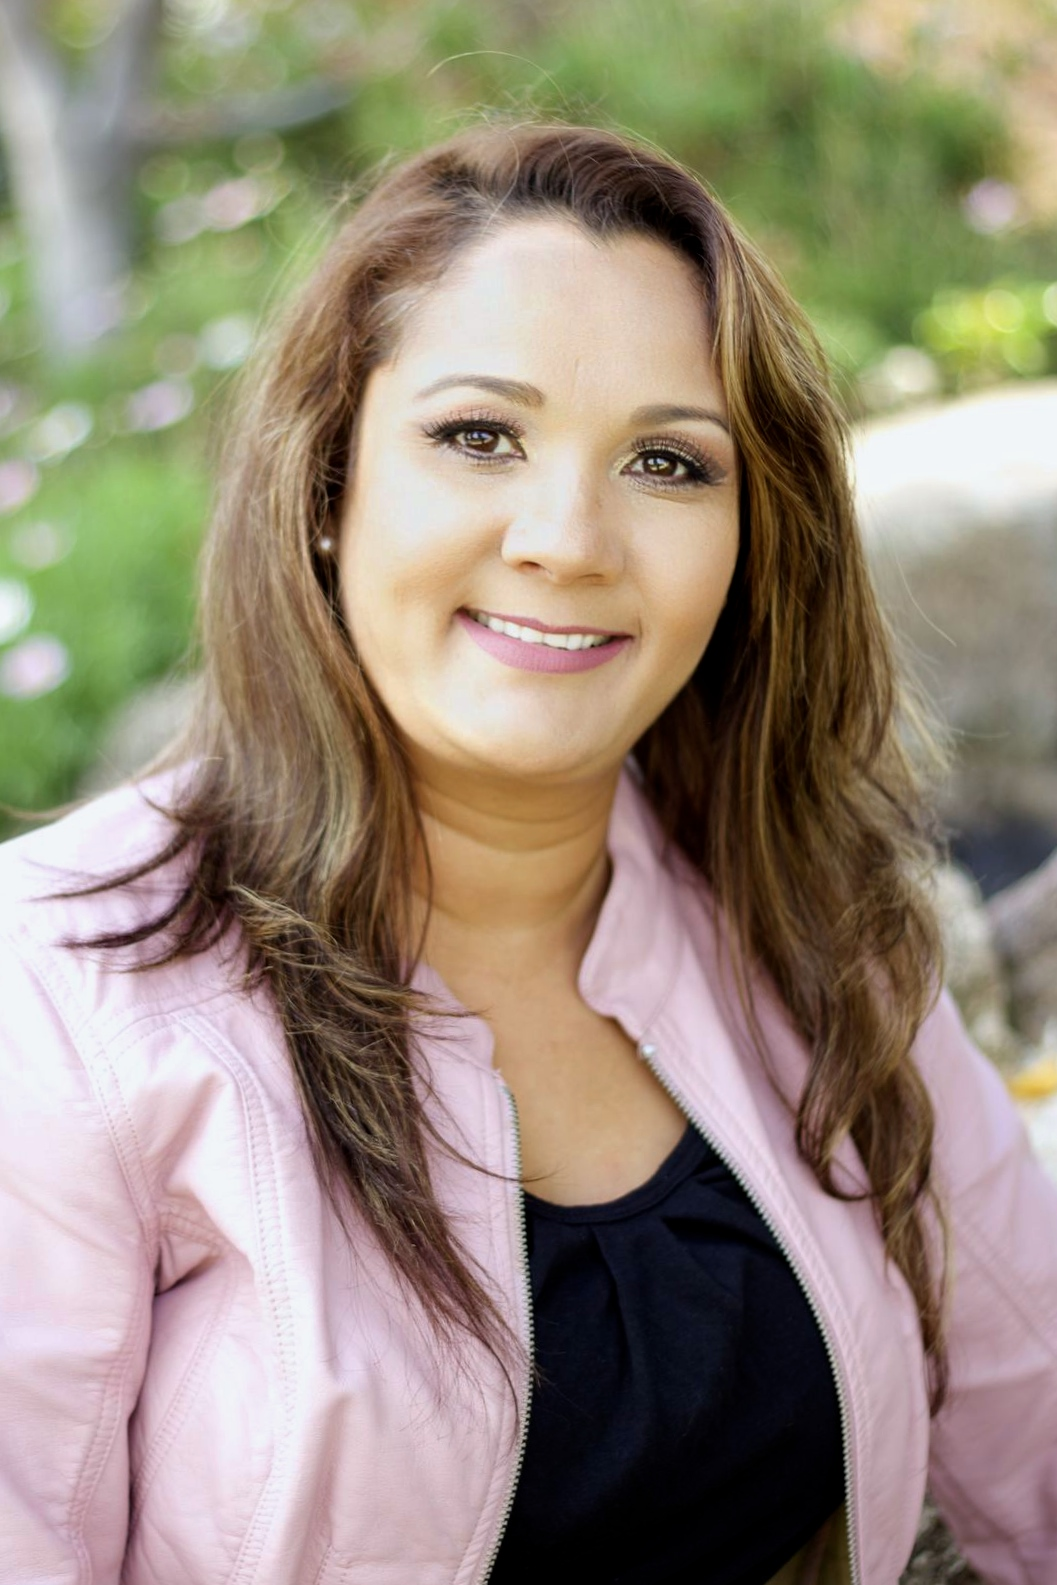 Guadalupe Miramontes